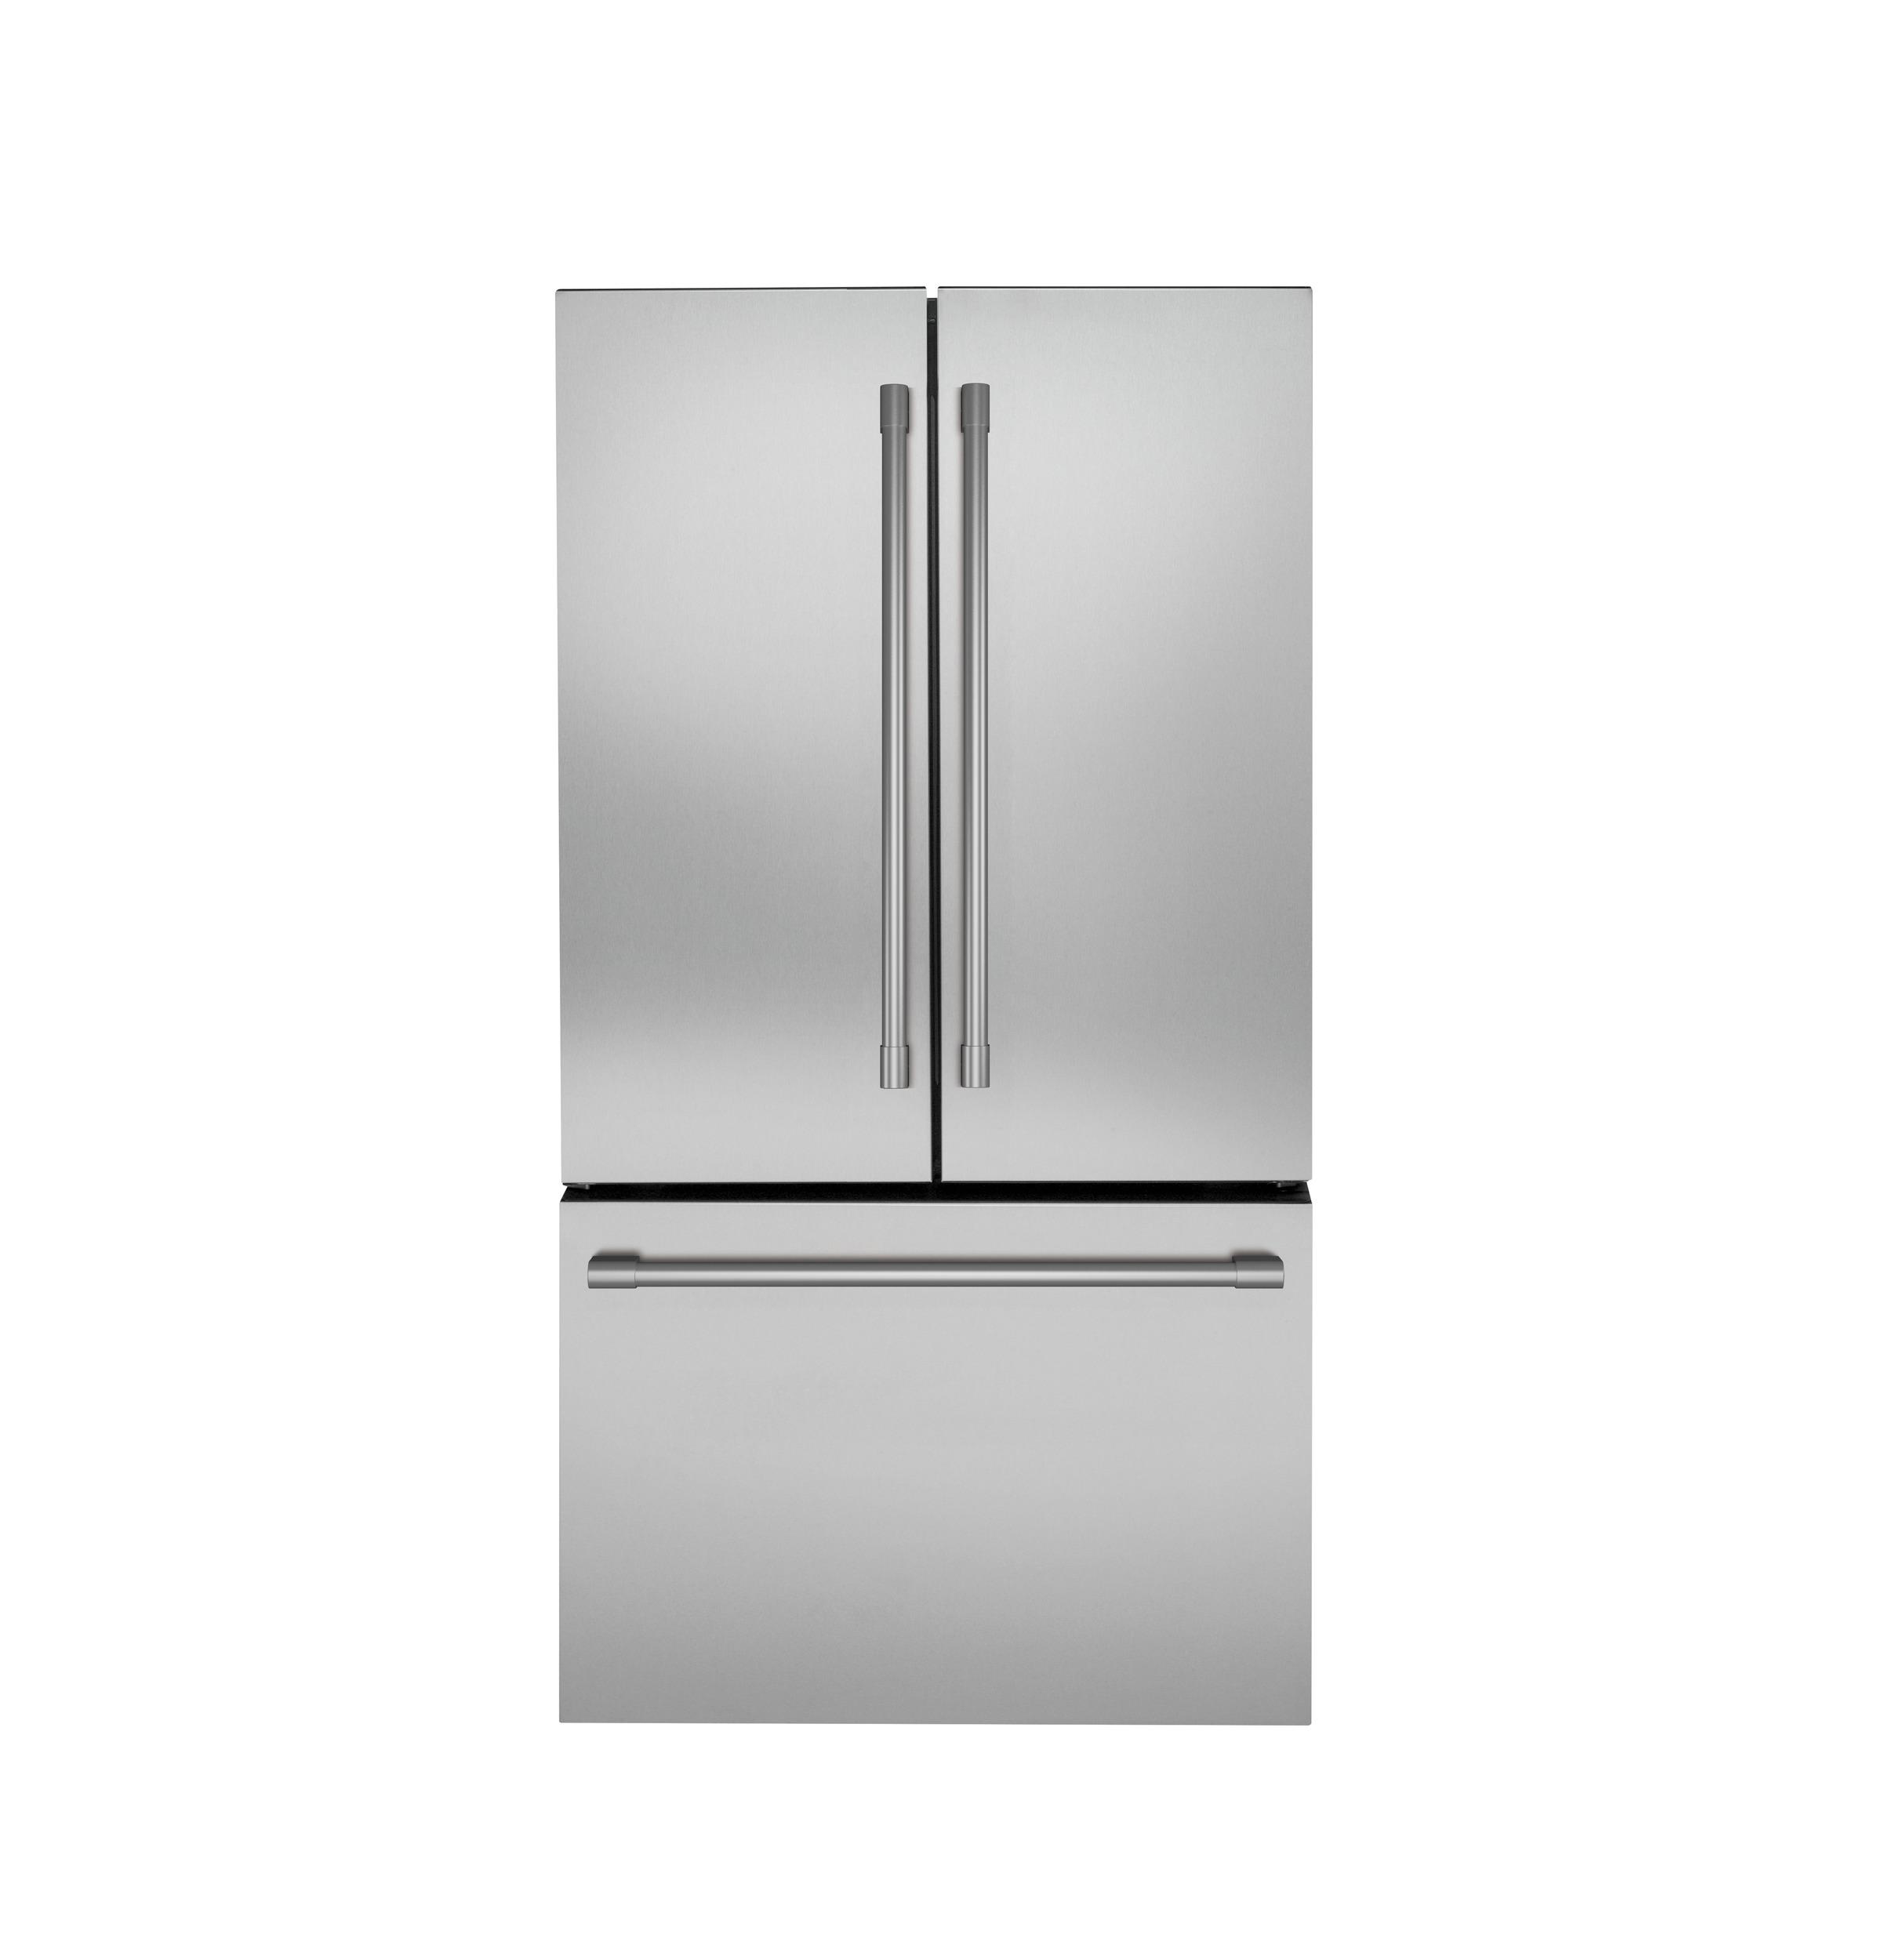 Monogram Monogram ENERGY STAR® 23.1 Cu. Ft. Counter-Depth French-Door Refrigerator